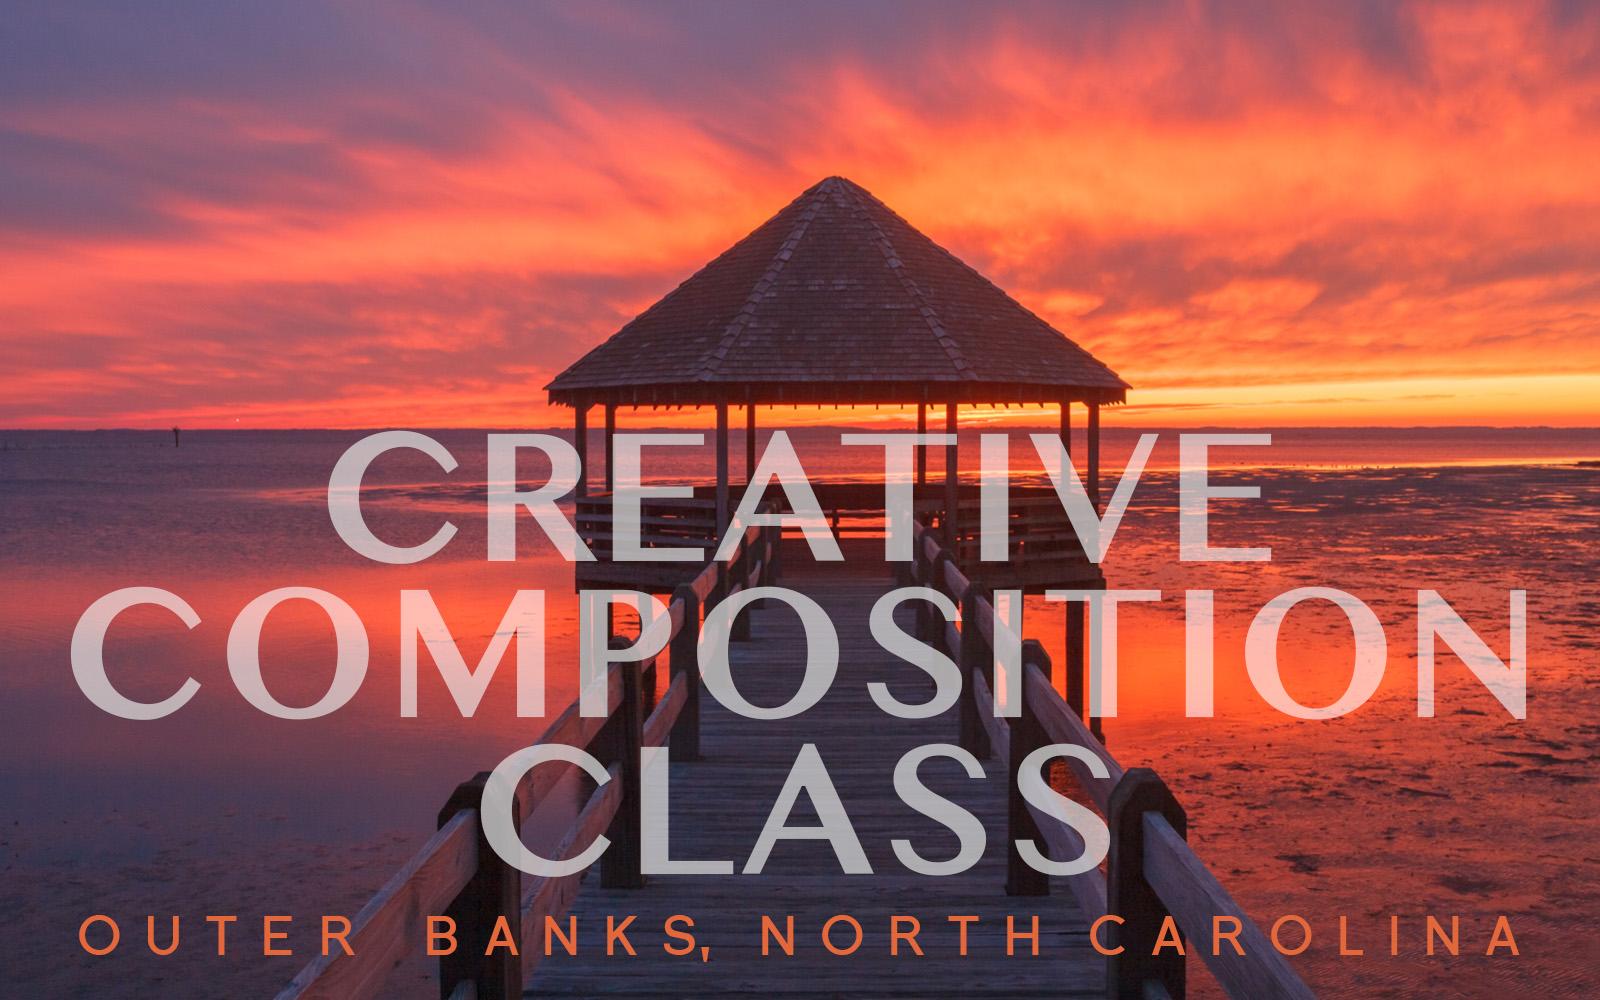 Creative Composition Class